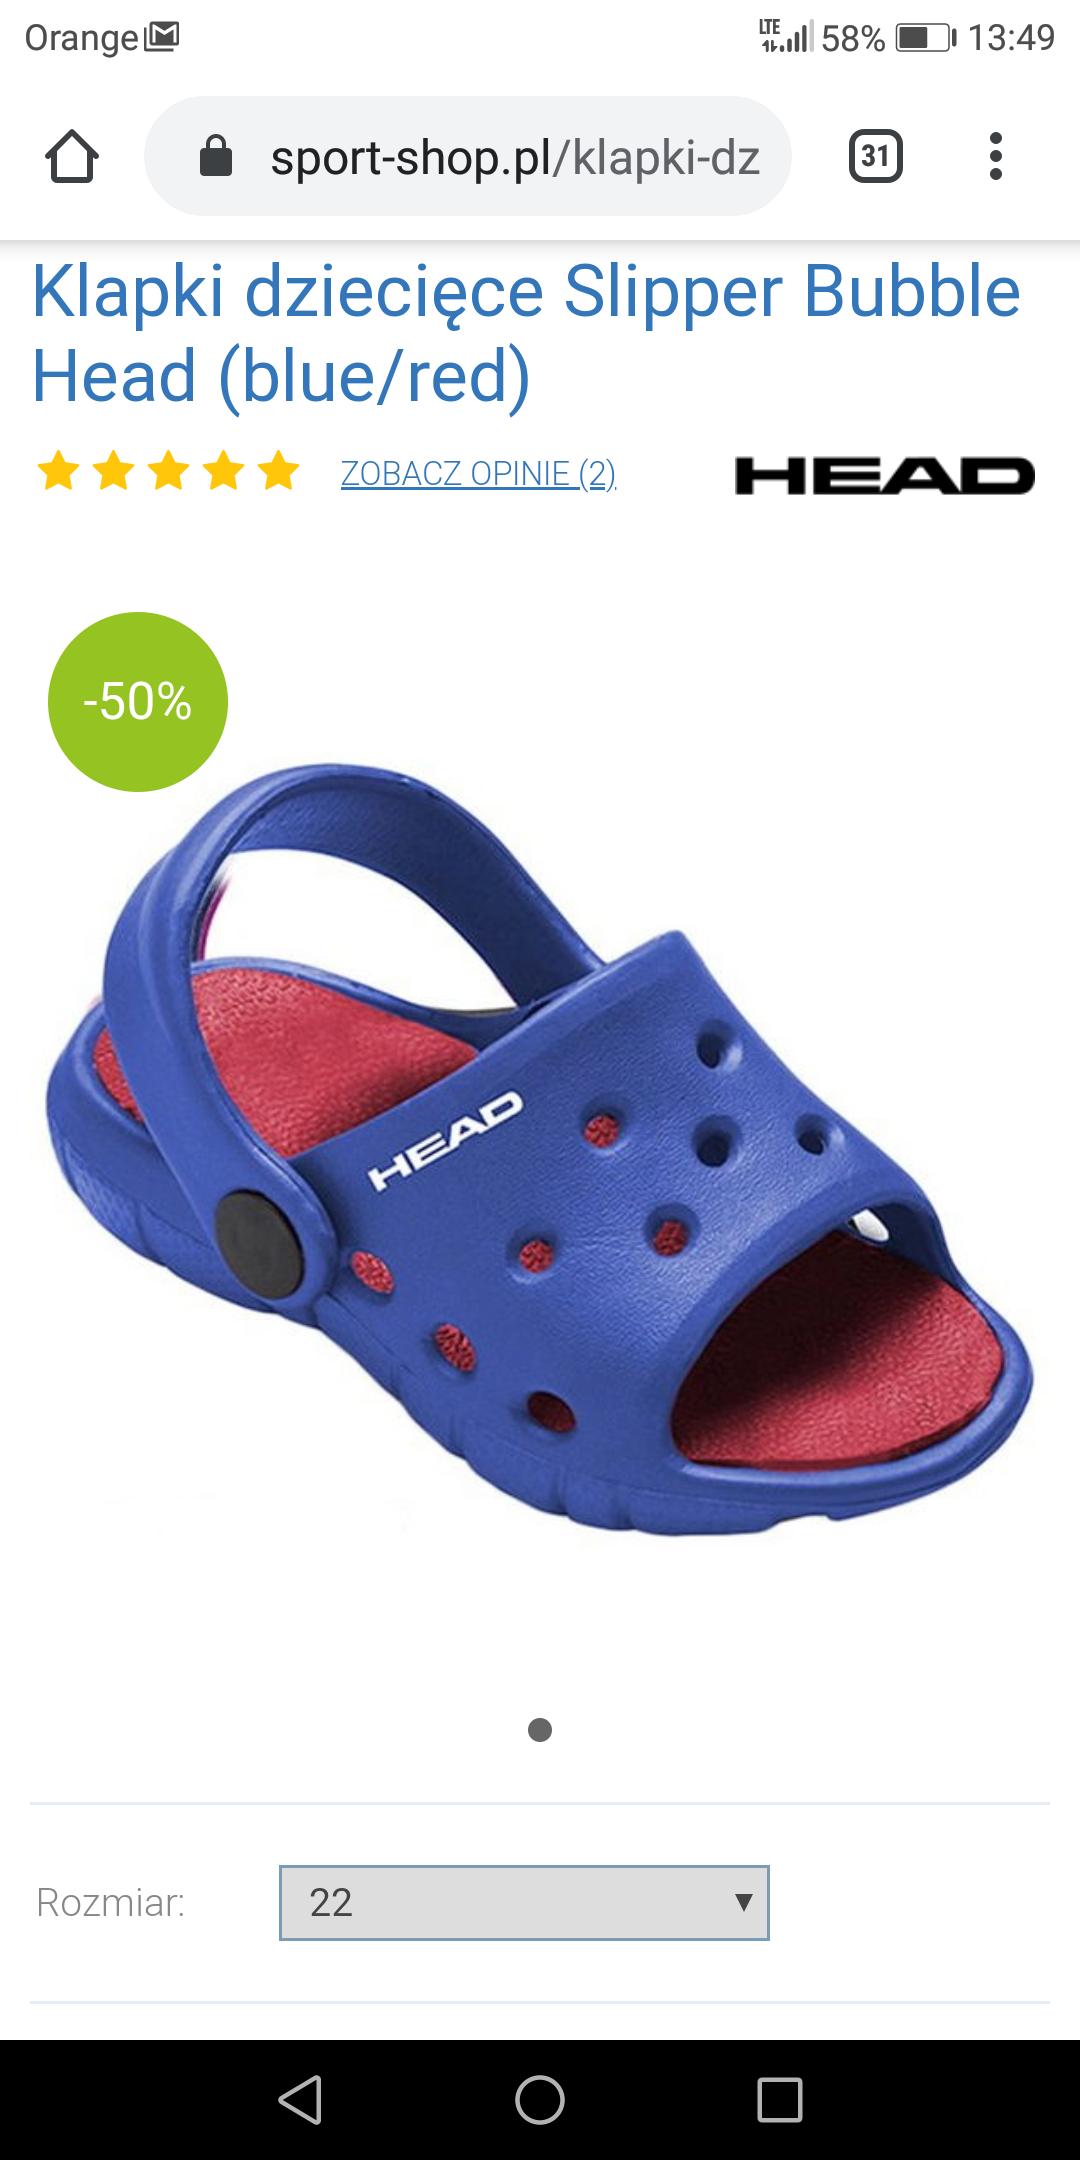 Klapki dziecięce Slipper Bubble Head (blue/red)